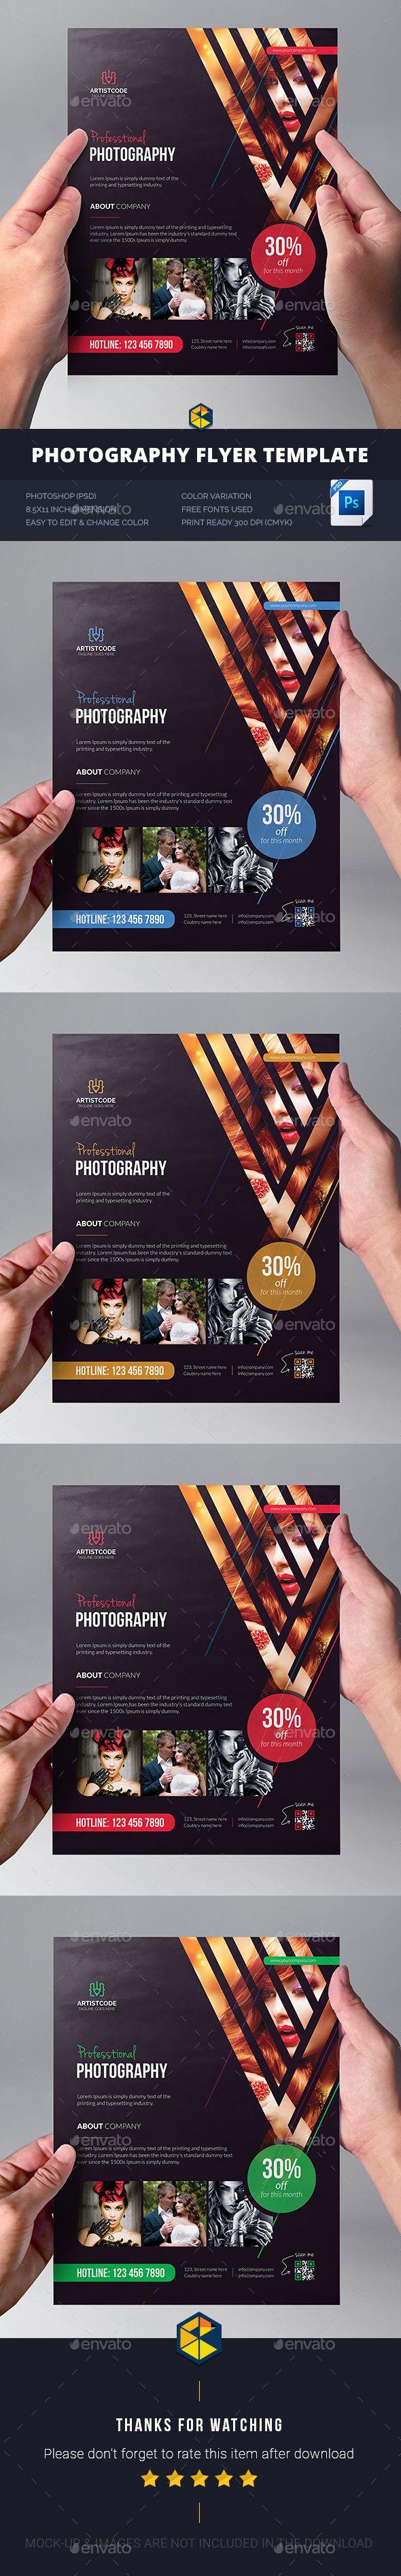 Photography Flyer 71 best Flyer Meyer images